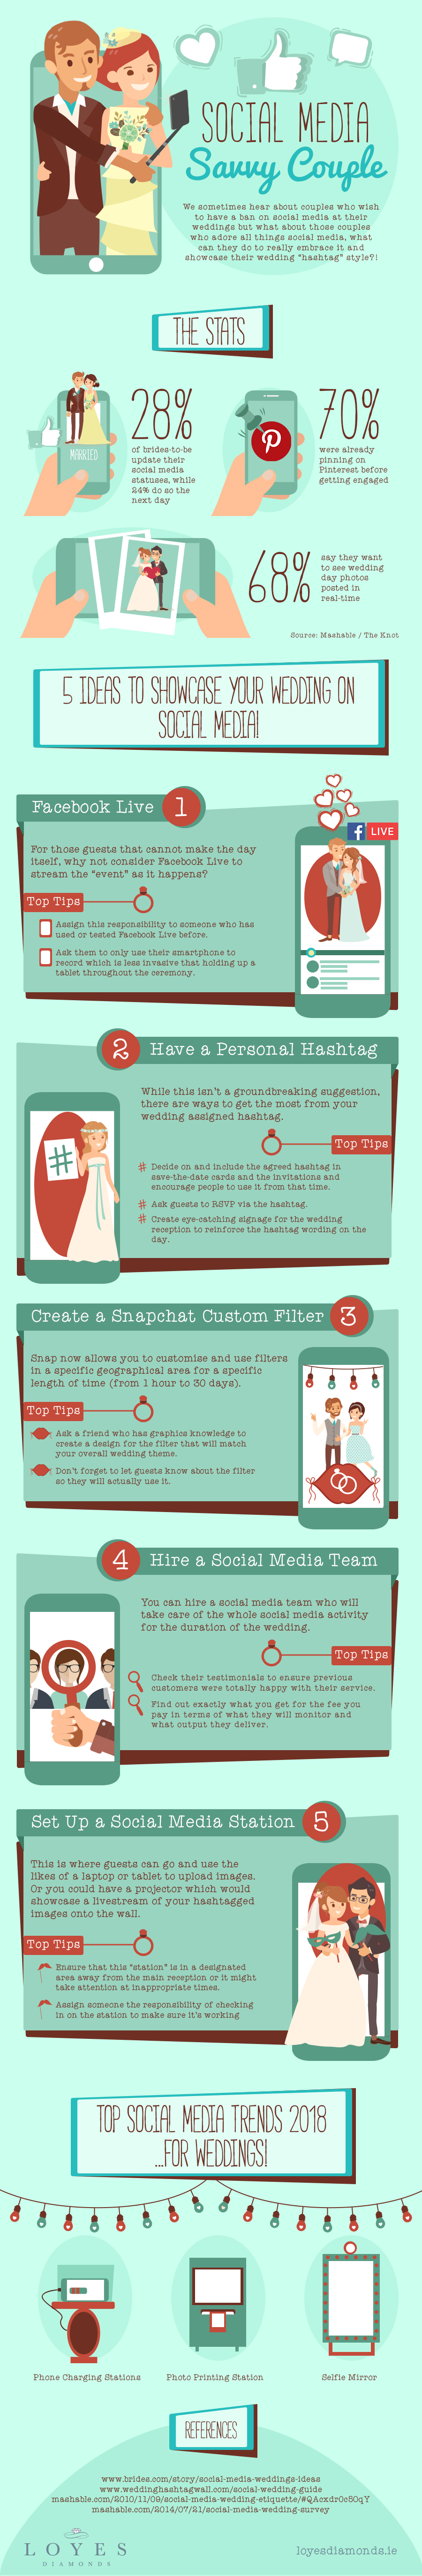 Social media savvy couple infographic.jpg